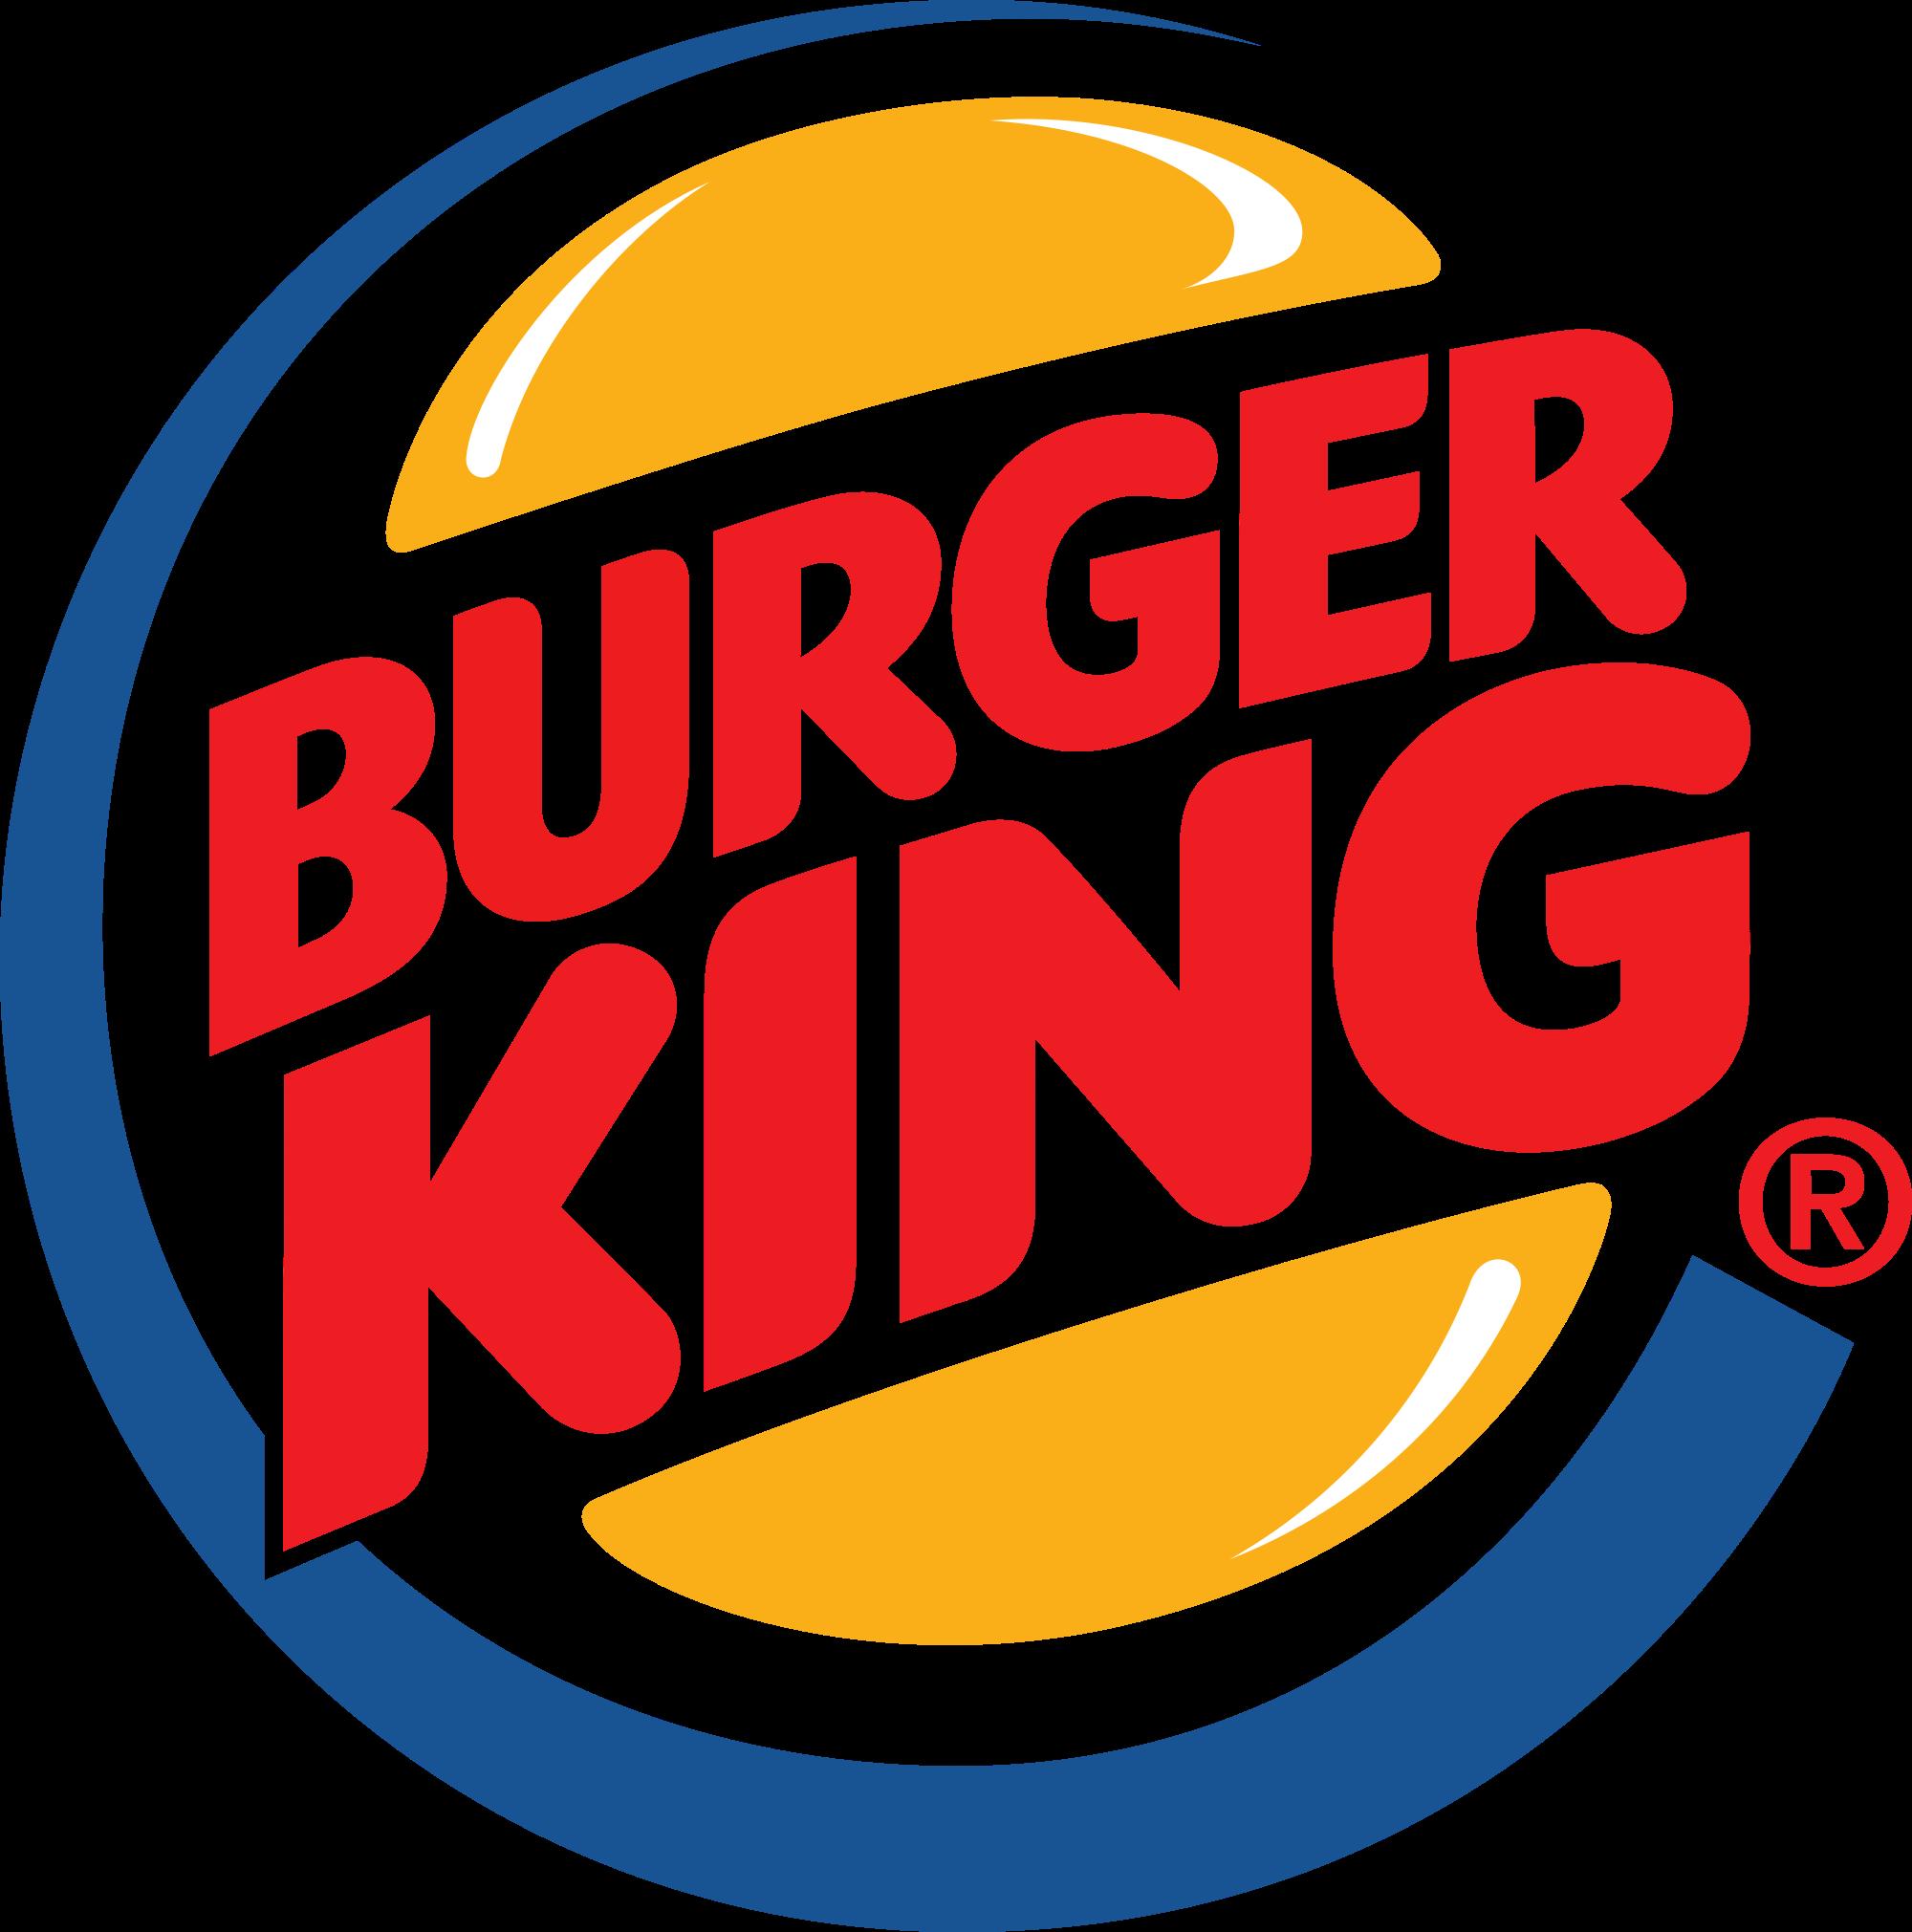 Burger King - Shipra Mall - Indirapuram - Ghaziabad Image